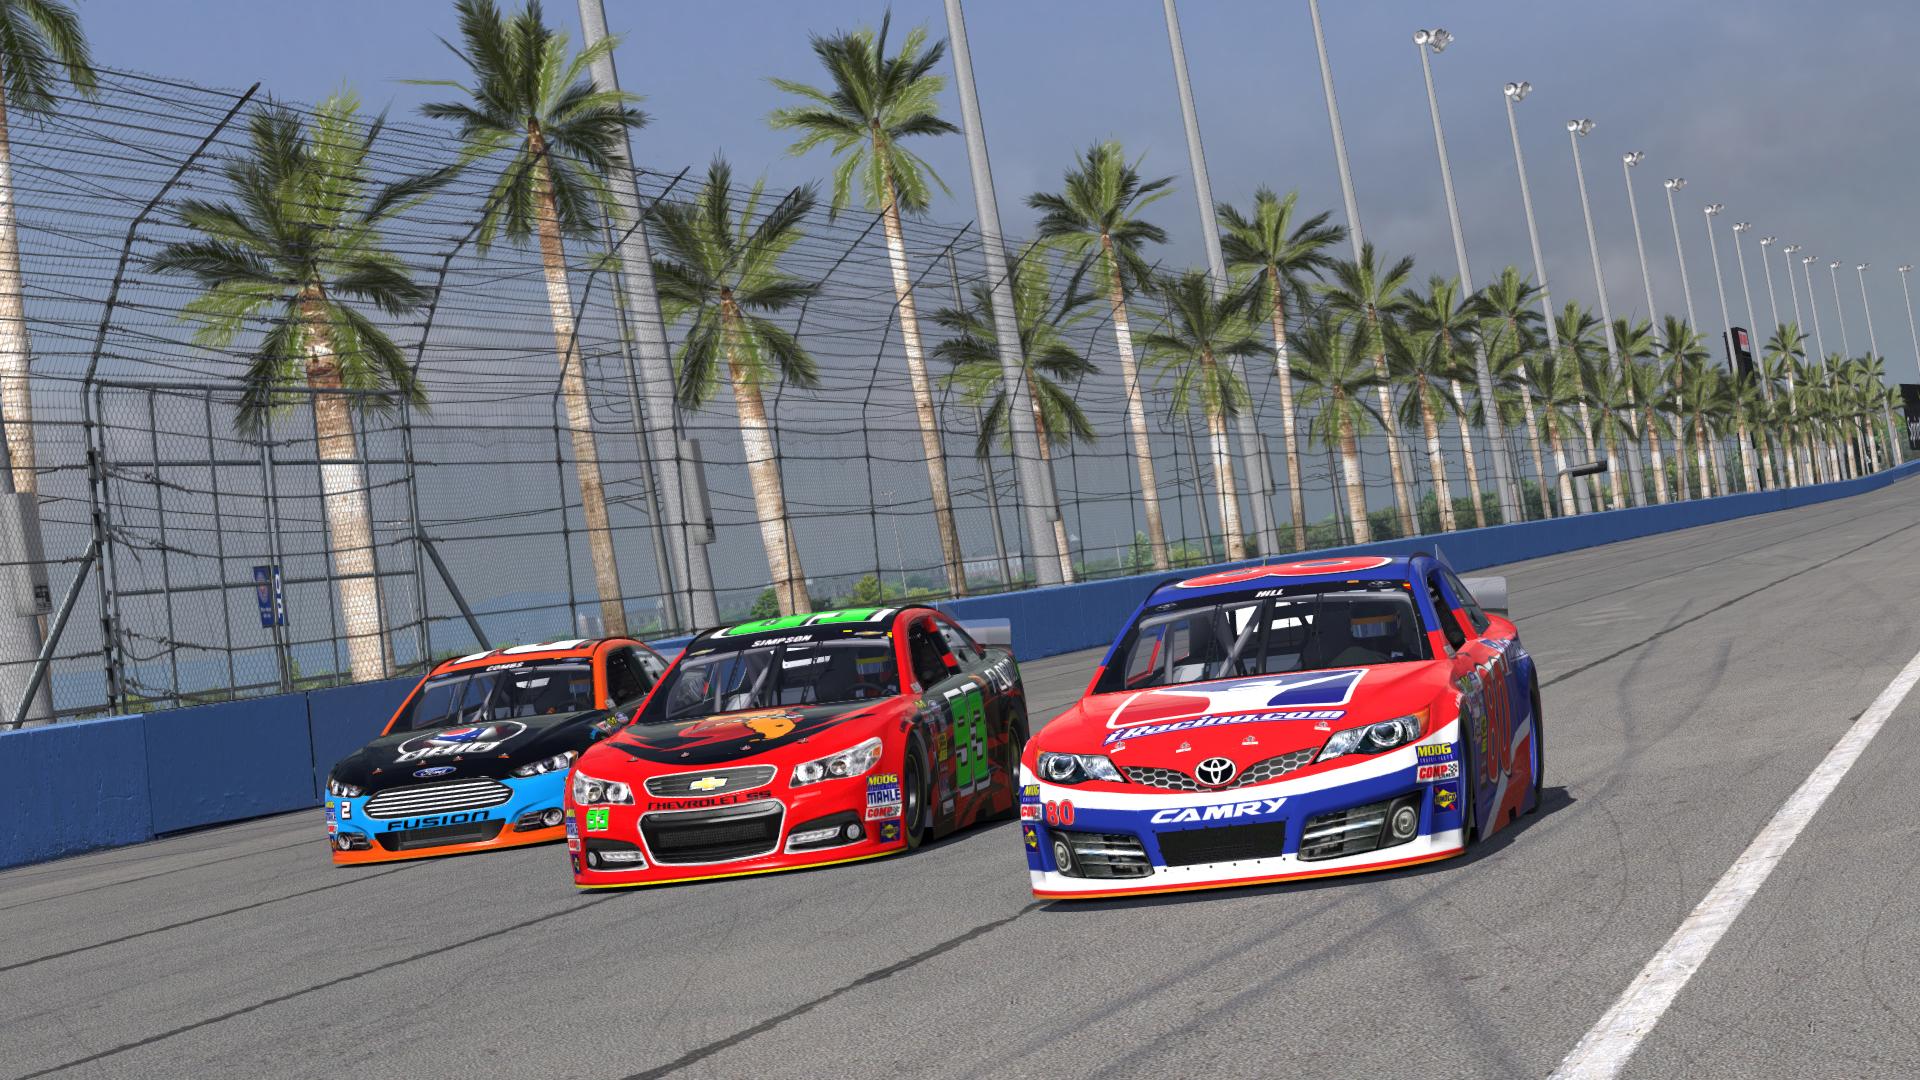 Screenshots Iracing Com Iracing Com Motorsport Simulations